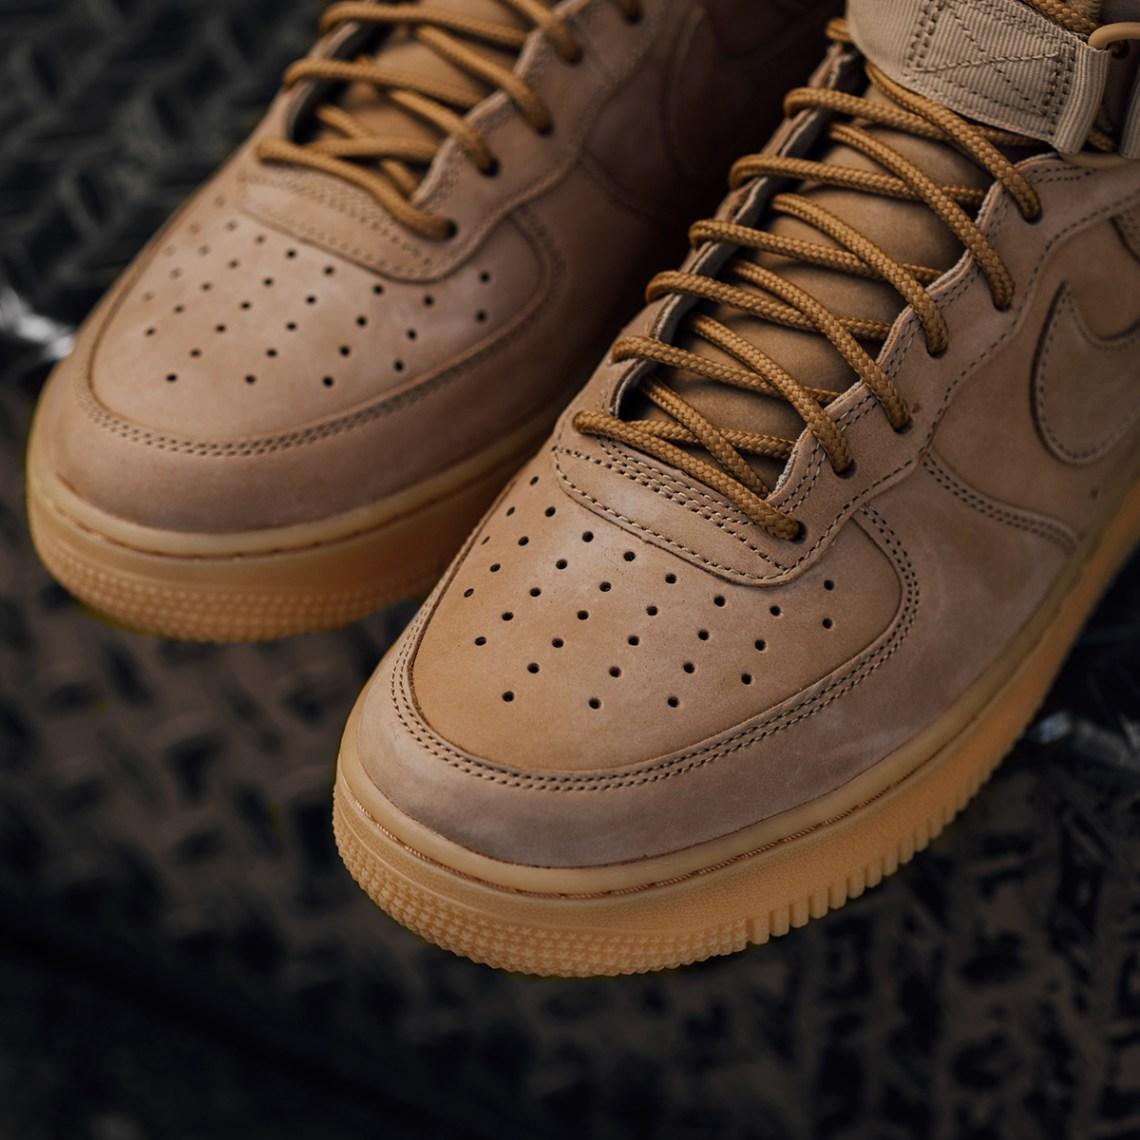 fef4d0b8 Nike Air Force 1 High